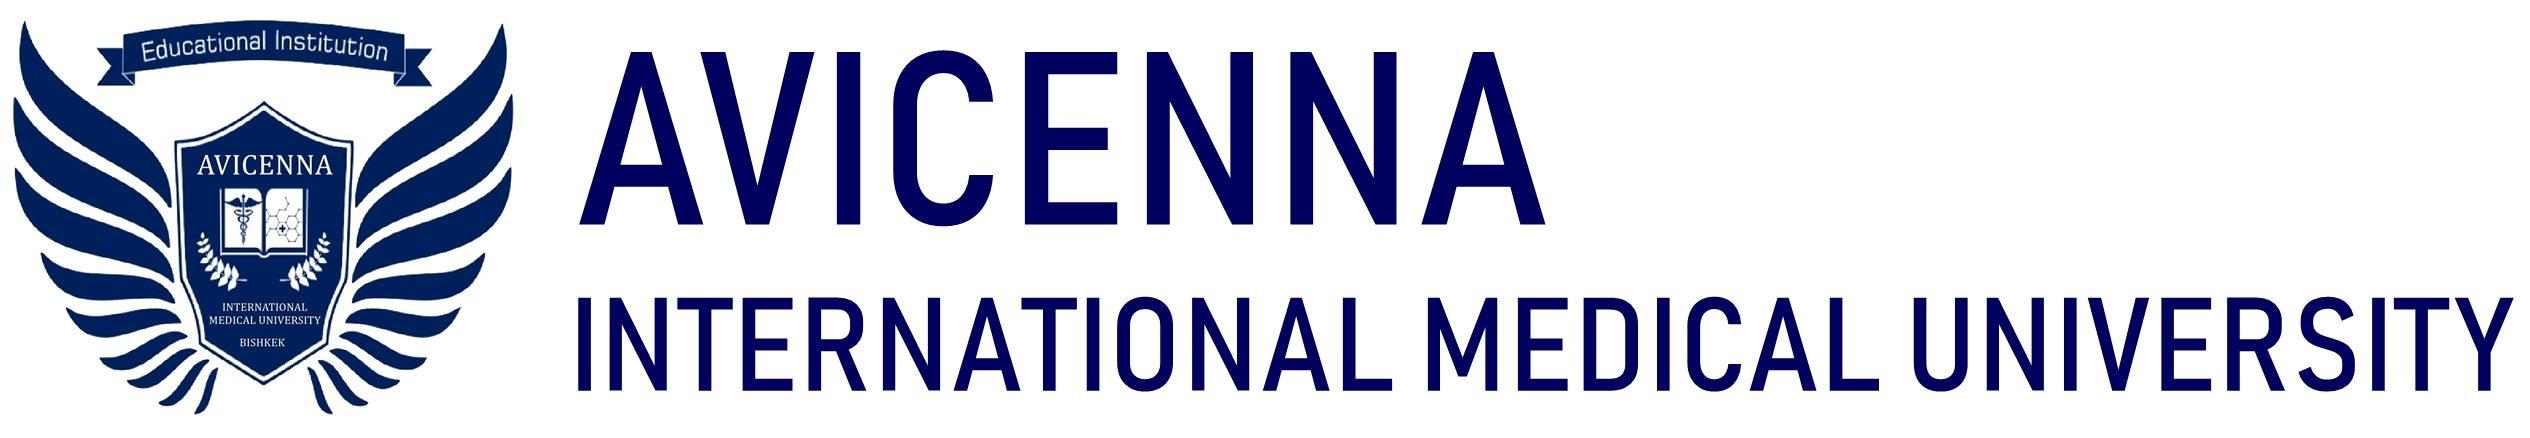 AVICENNA INTERNATIONAL MEDICAL UNIVERSITY